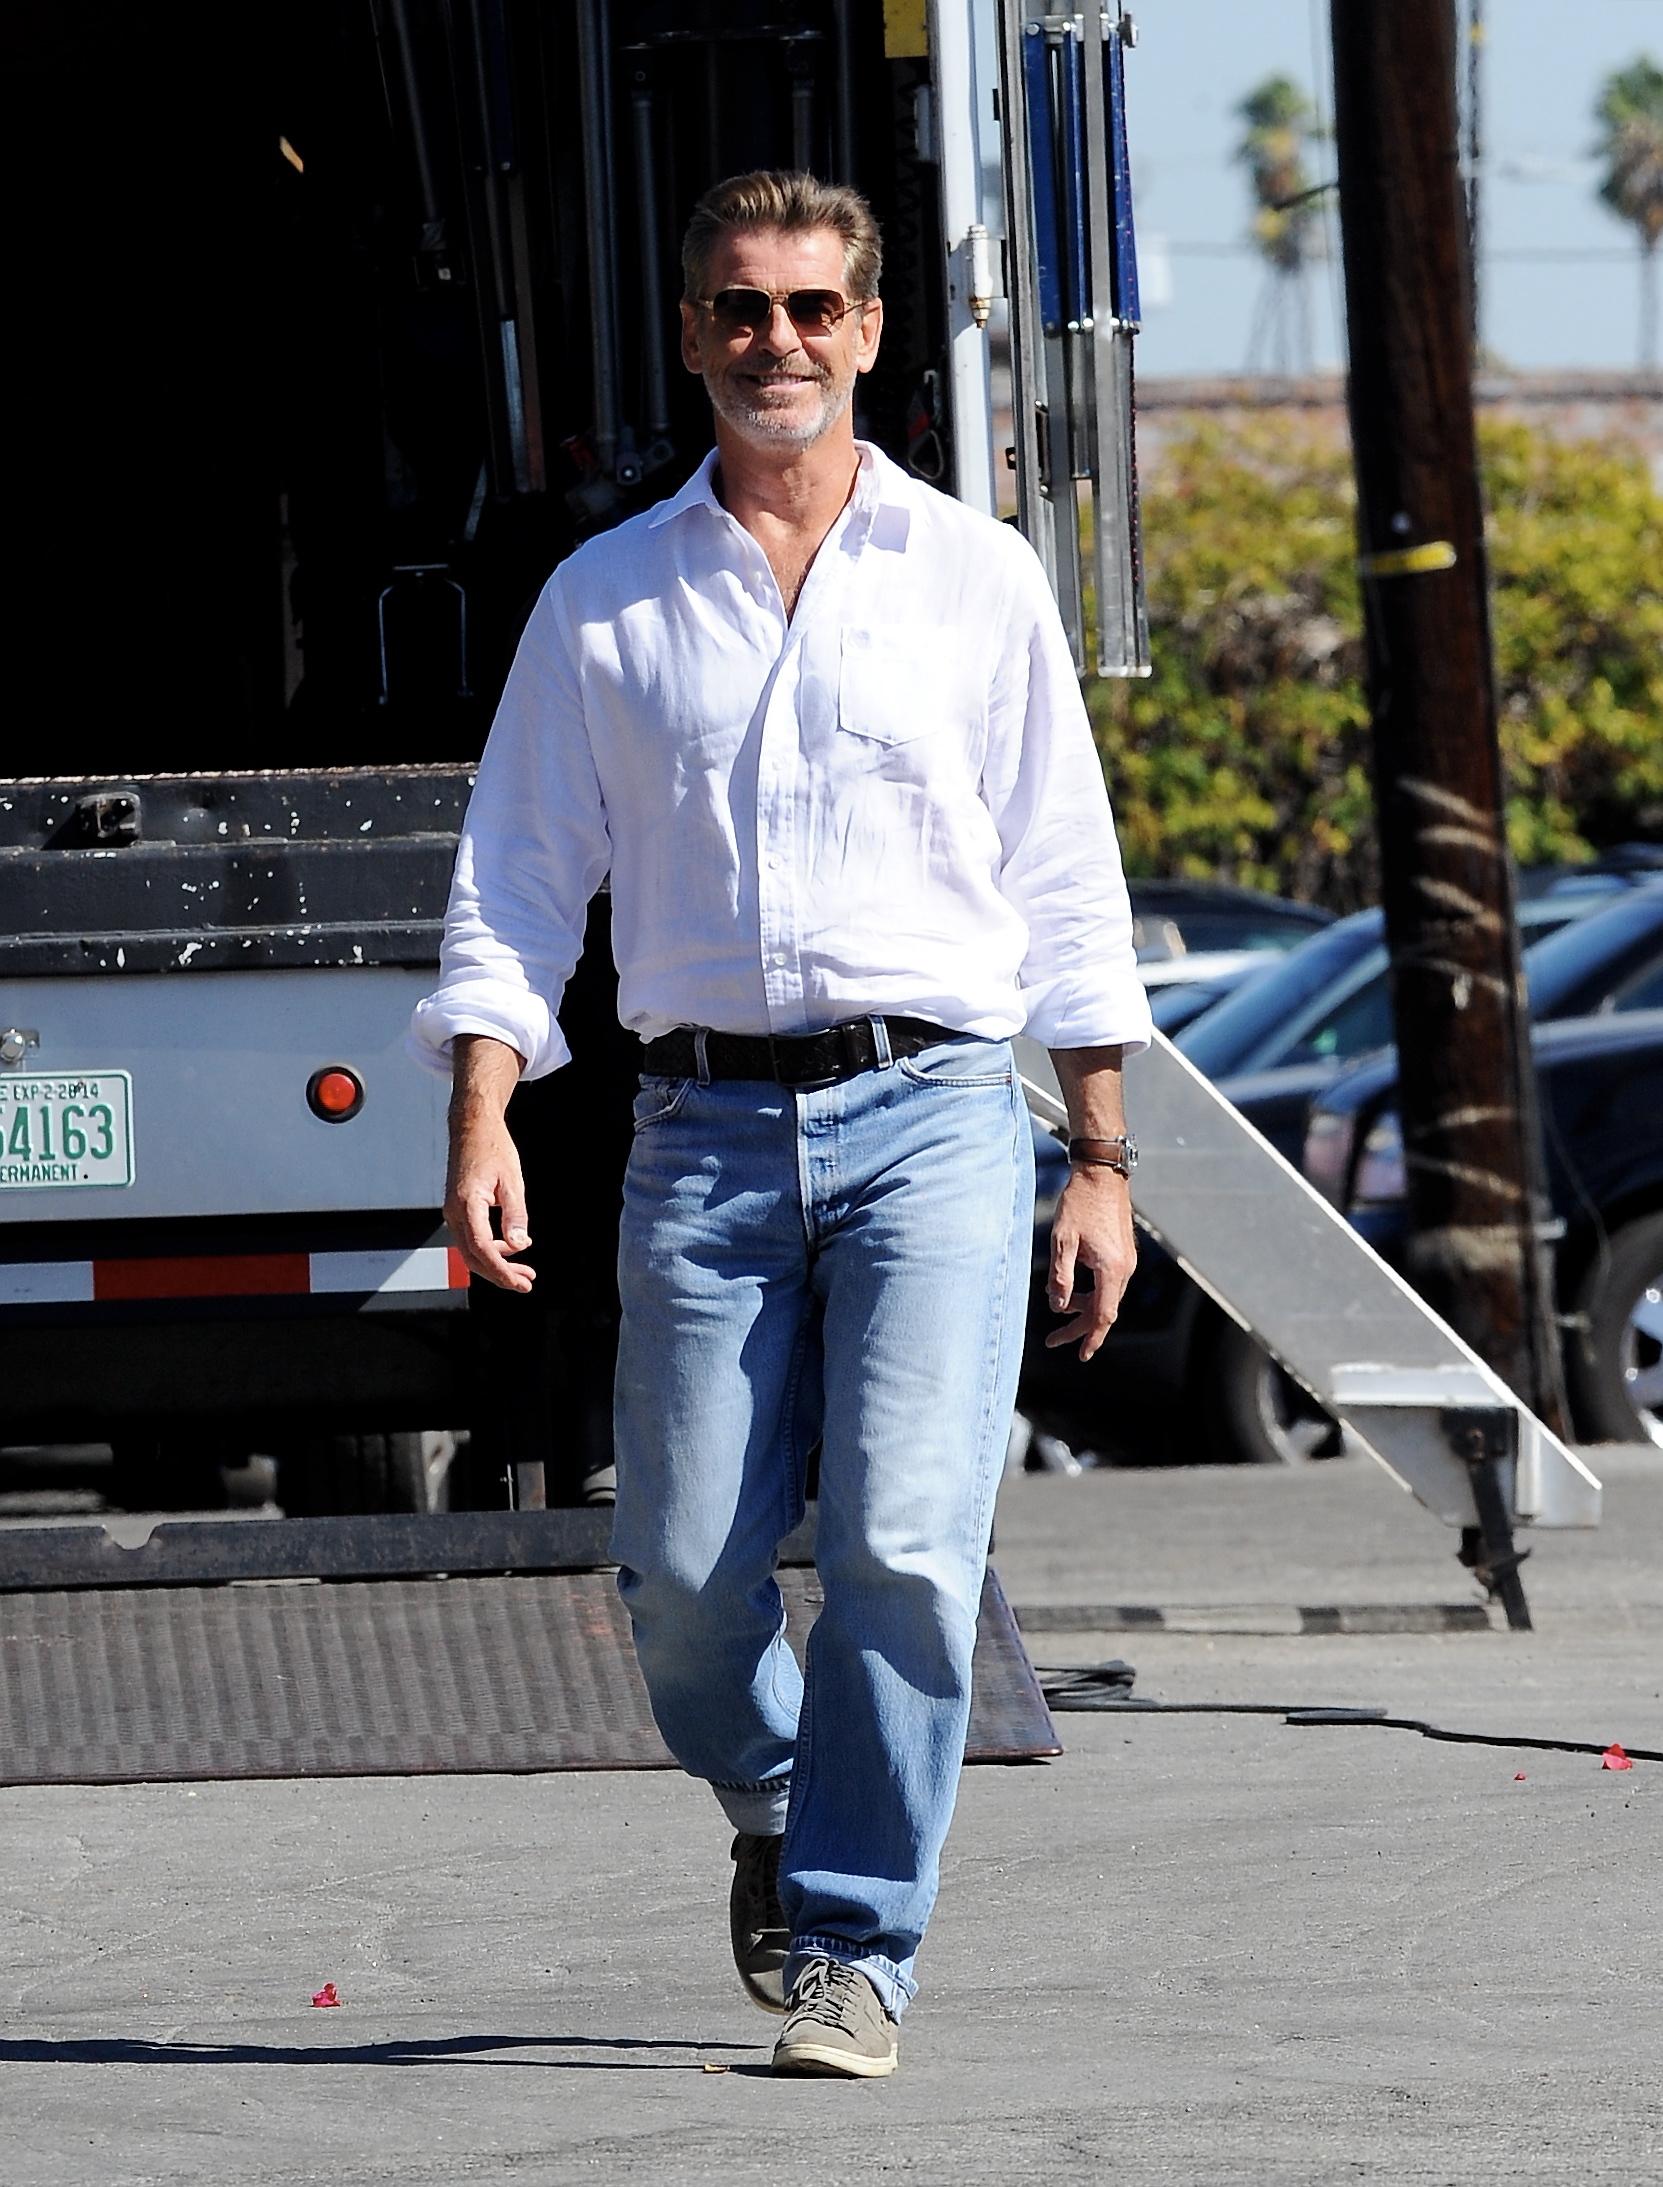 Pierce Brosnan Filming On Location